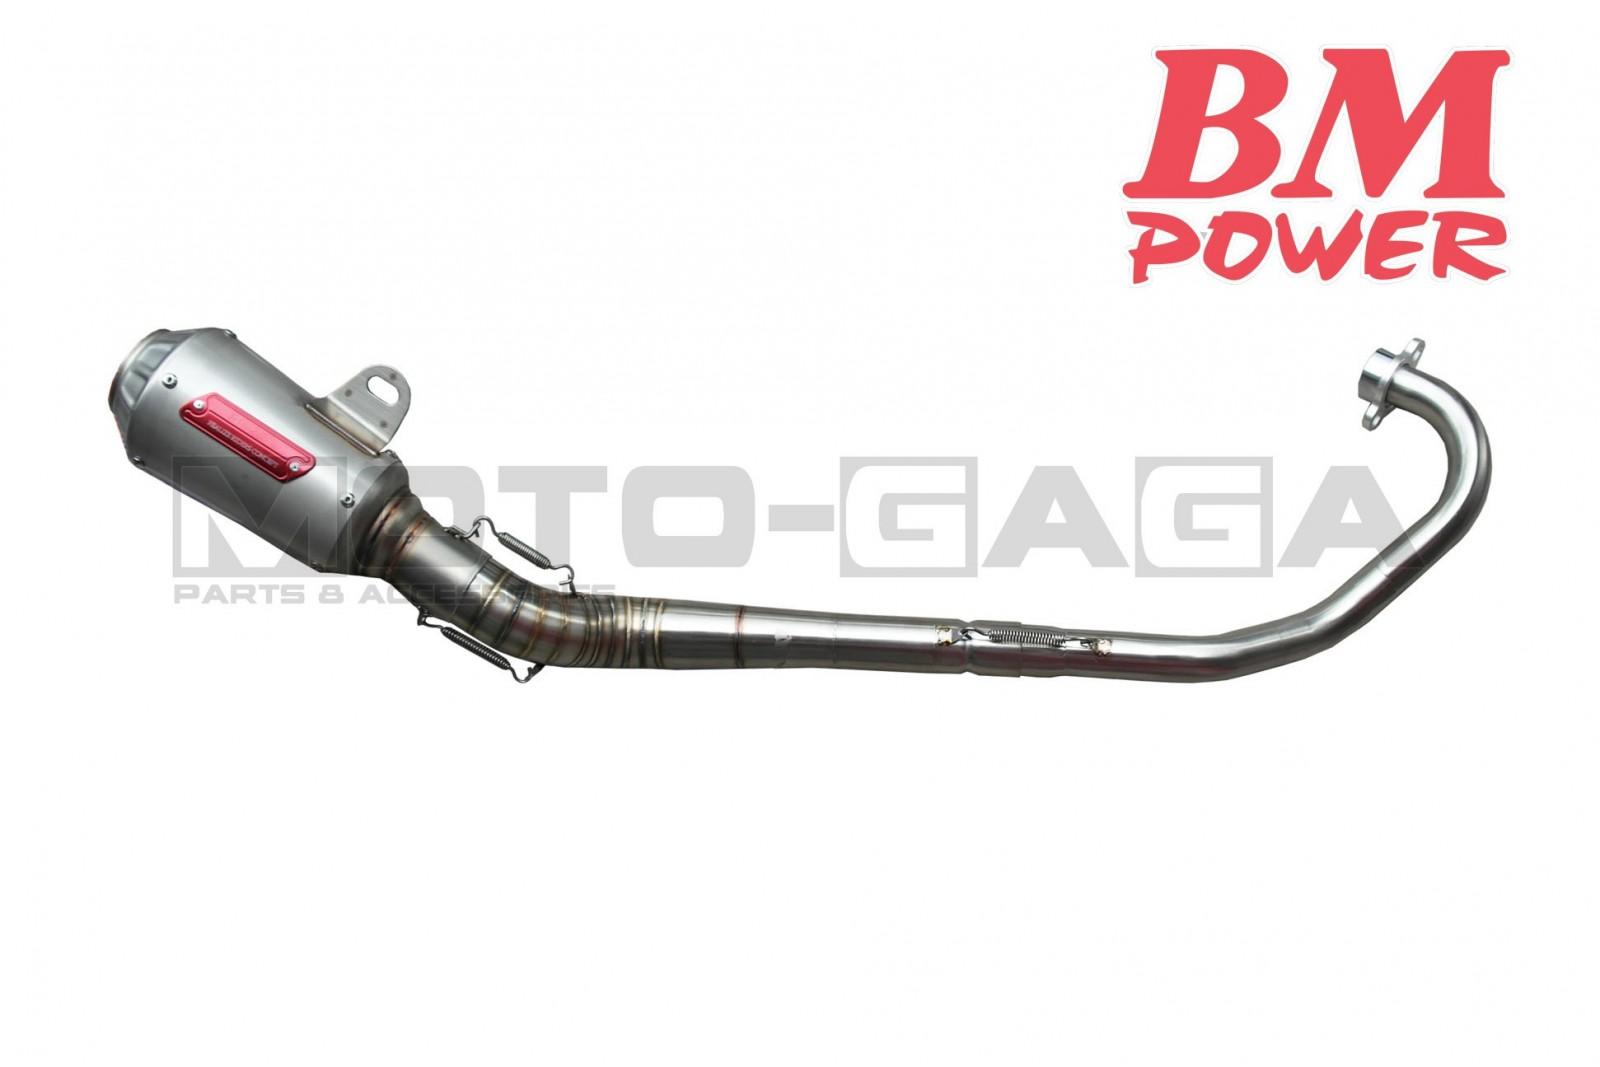 BM Power GP2 Racing Exhaust - Yamaha Y15ZR/Jupiter MX King/Crypton  X/Spark/Exciter/Sniper T150